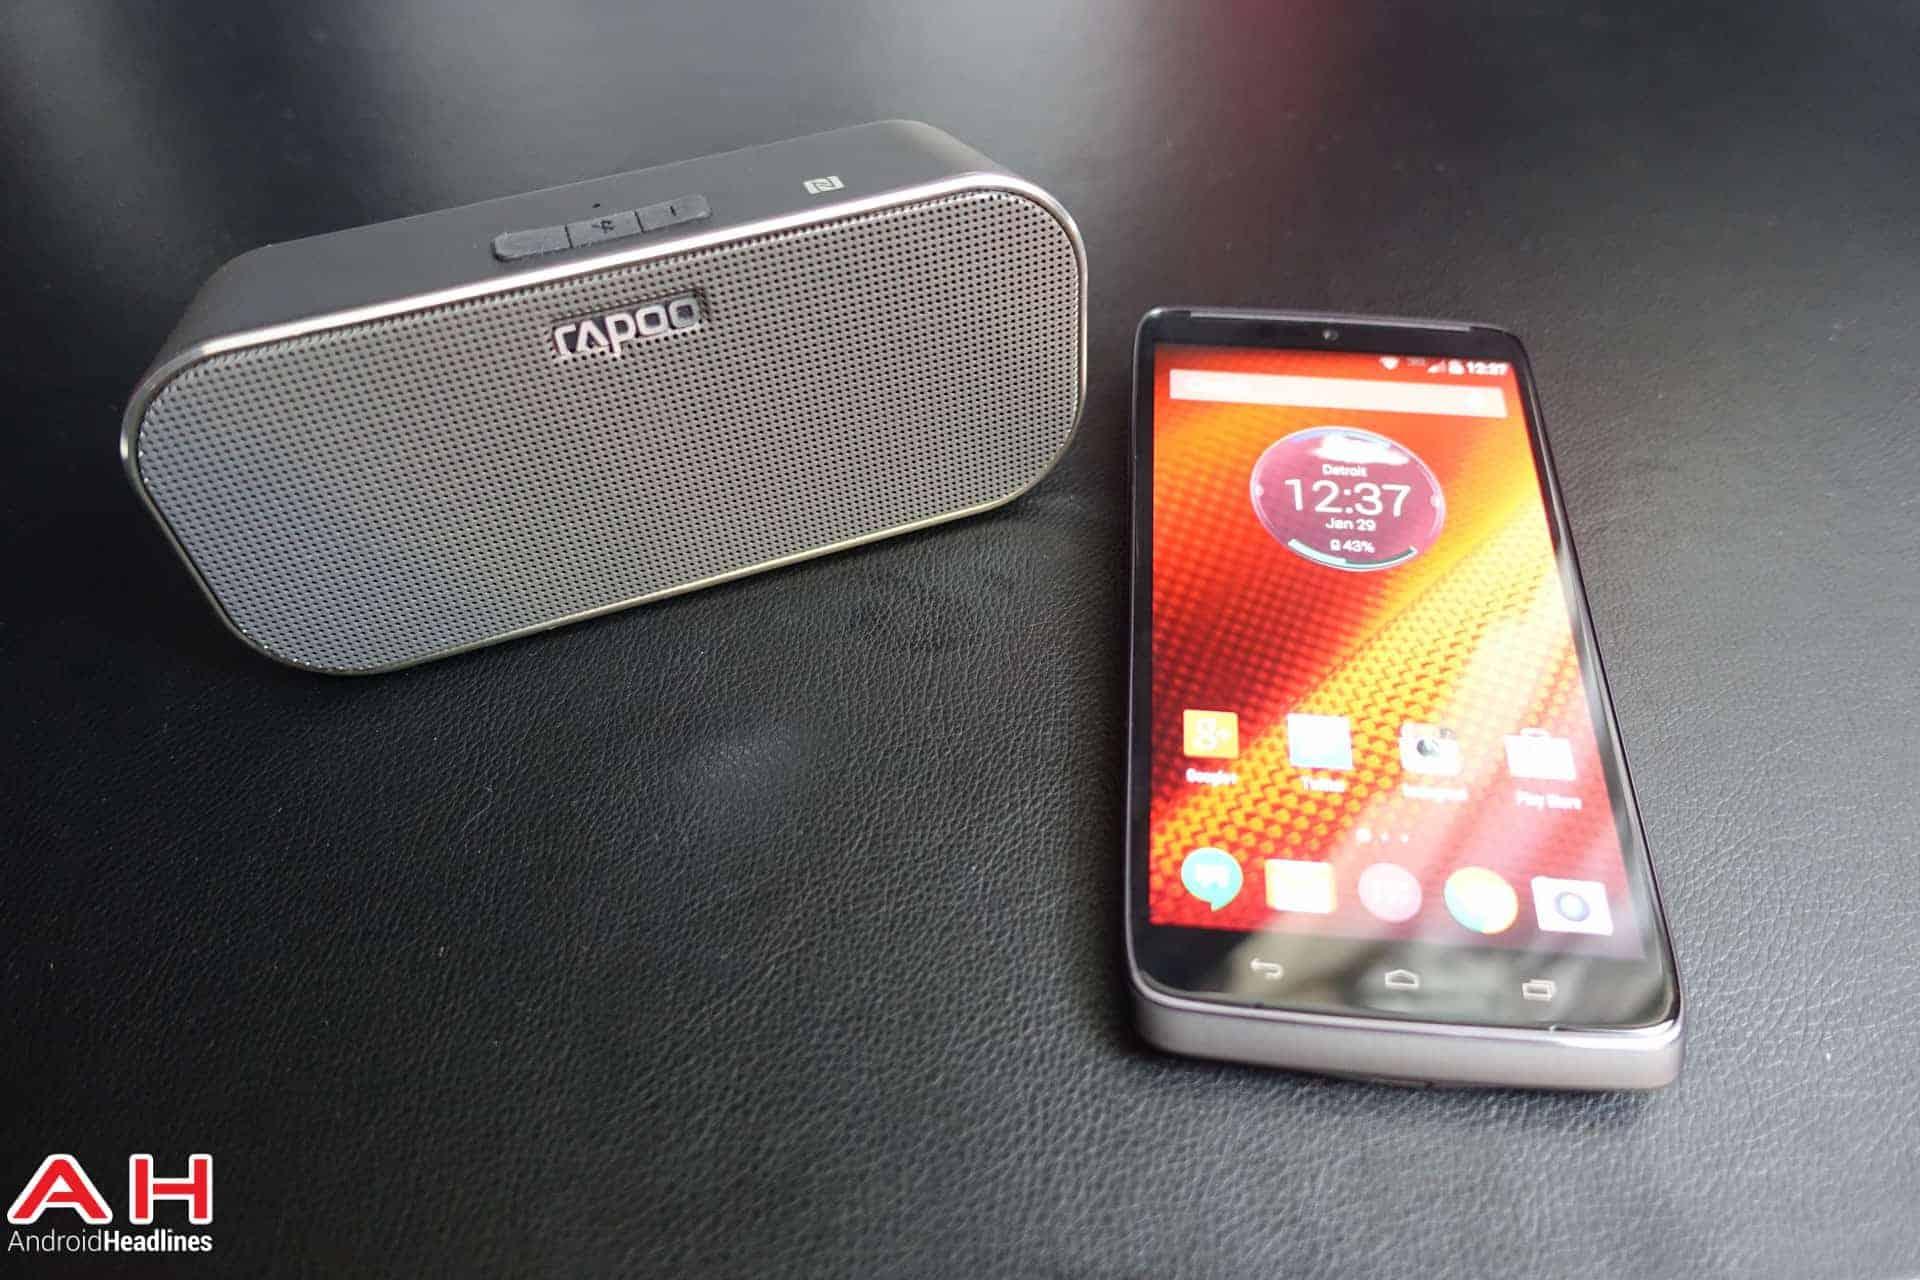 Rapoo-A500-Bluetooth-Speaker-Review-AH-03397